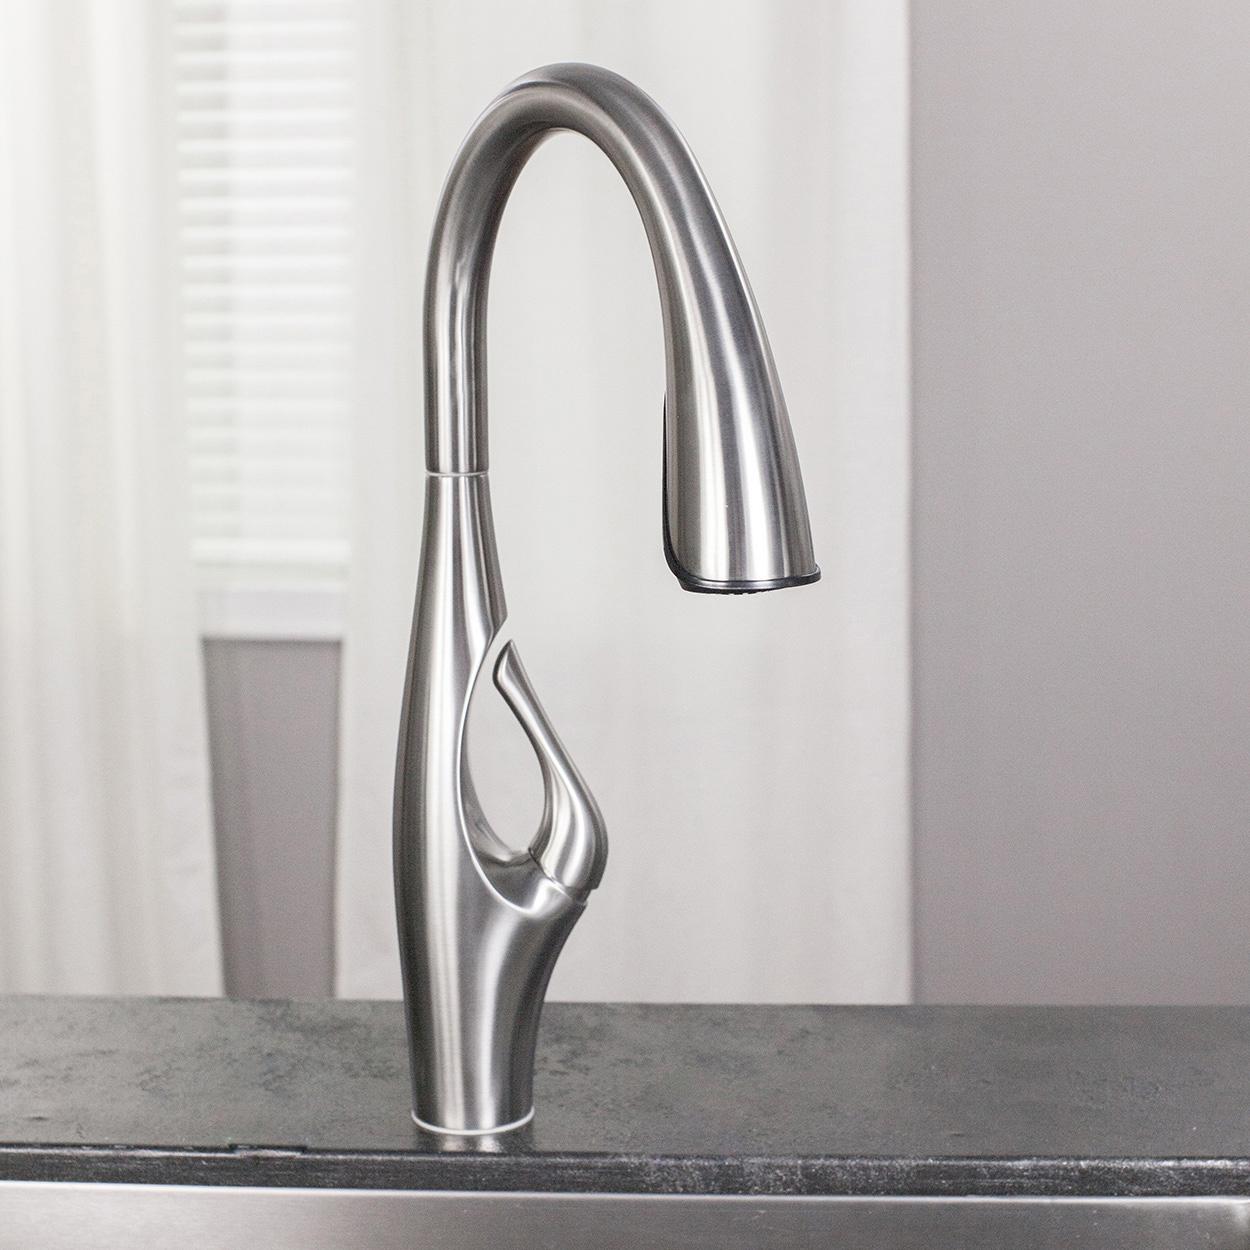 Bath4All - Pfister GT529IHB Kai 1.8 GPM Pull Down Kitchen Faucet